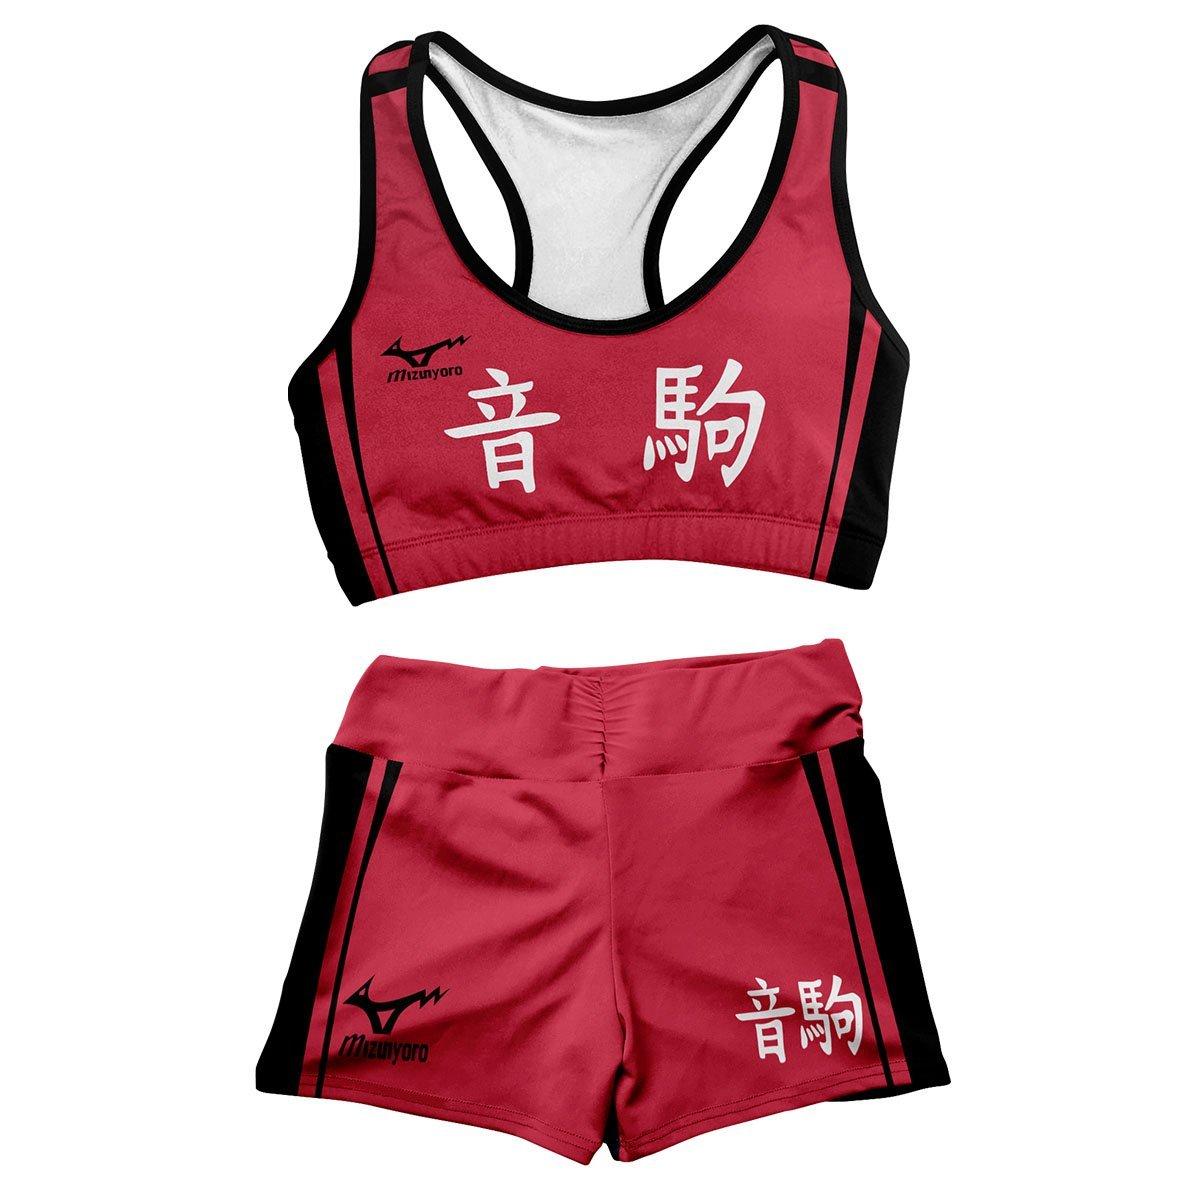 Team Nekoma Active Wear Set FDM3107 Entire Set Official Anime Swimsuit Merch